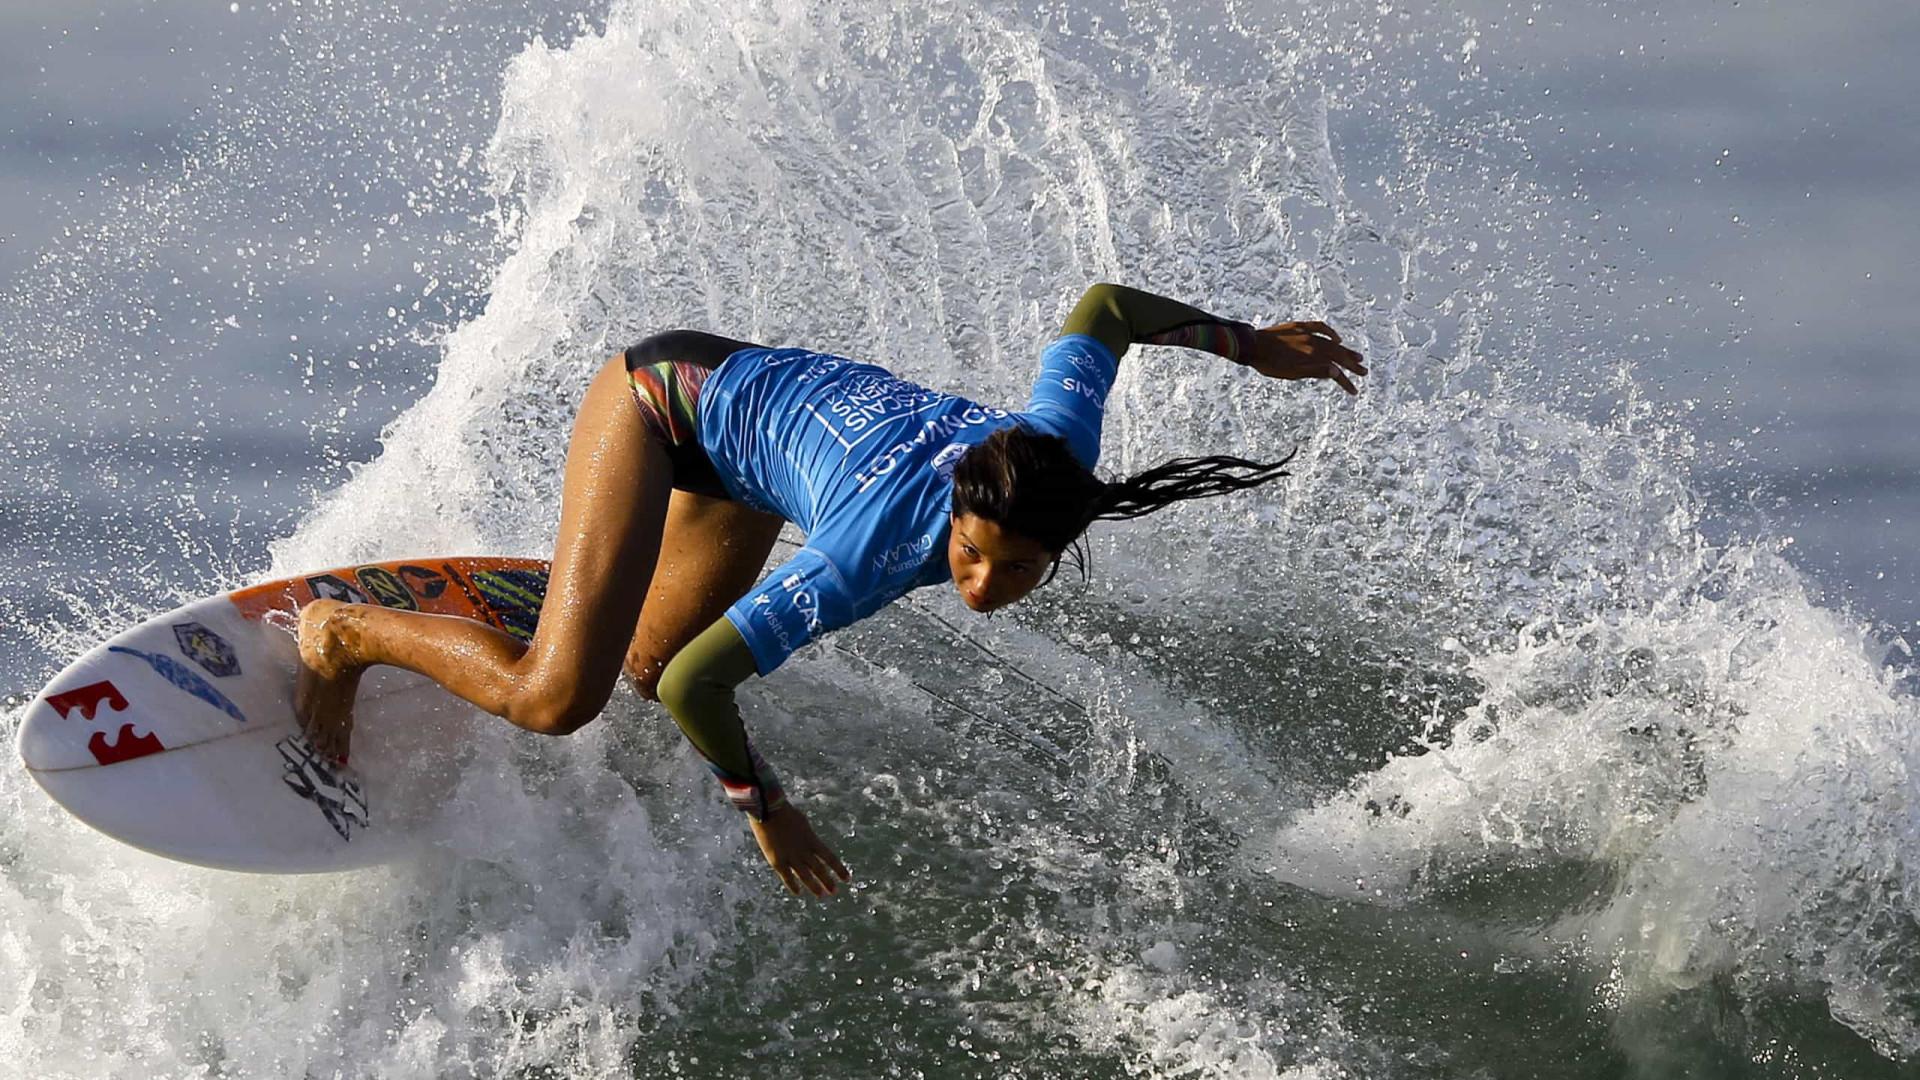 Circuito Mundial De Surf : Notícias ao minuto teresa bonvalot convidada para etapa de cascais